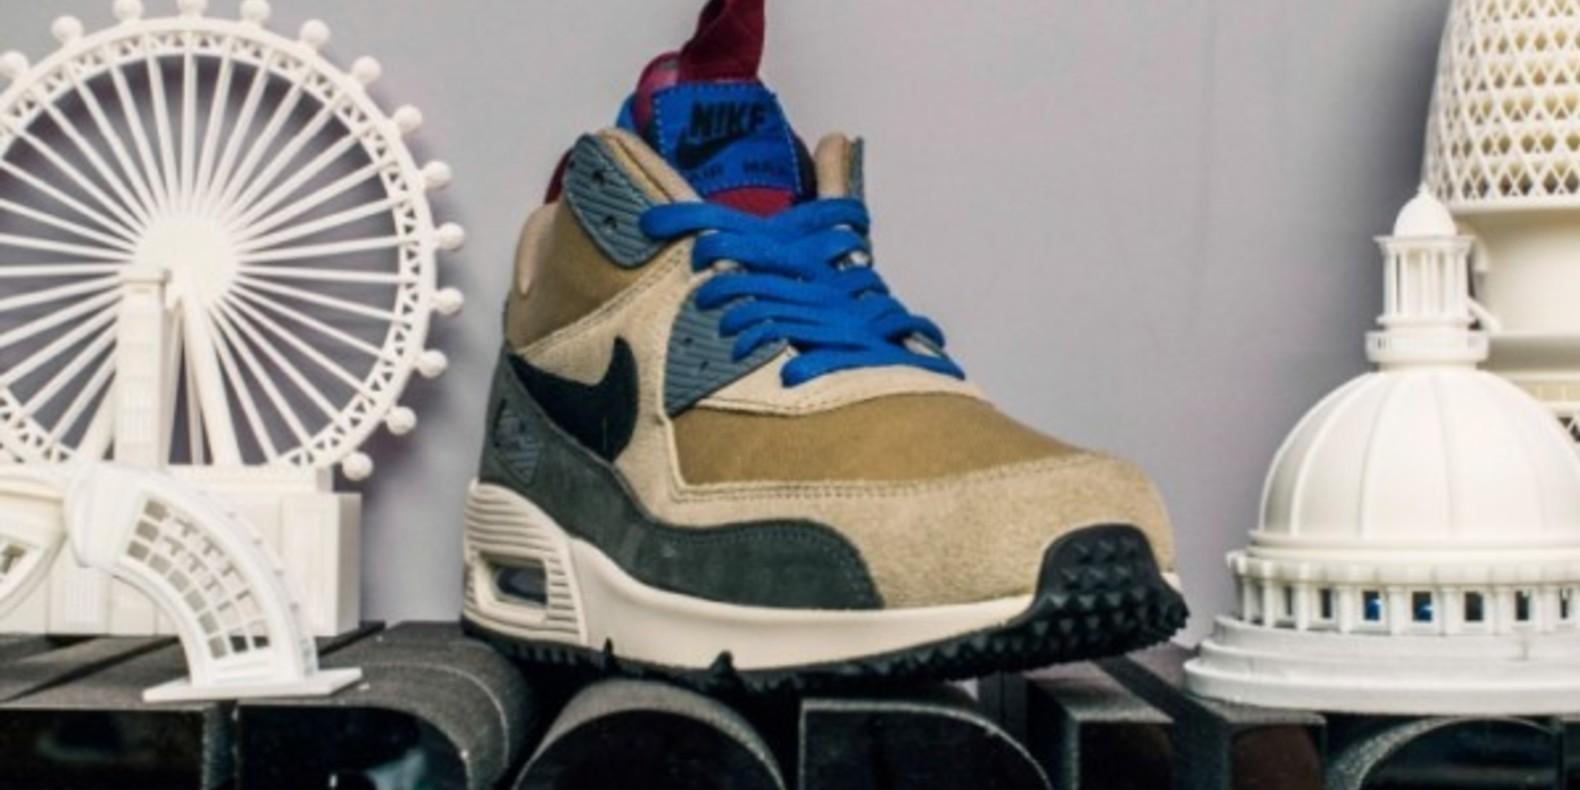 Nike imprime en 3D sneakerboots event modla rosie lee london paris londres cults3D cults impression 3D printed printing